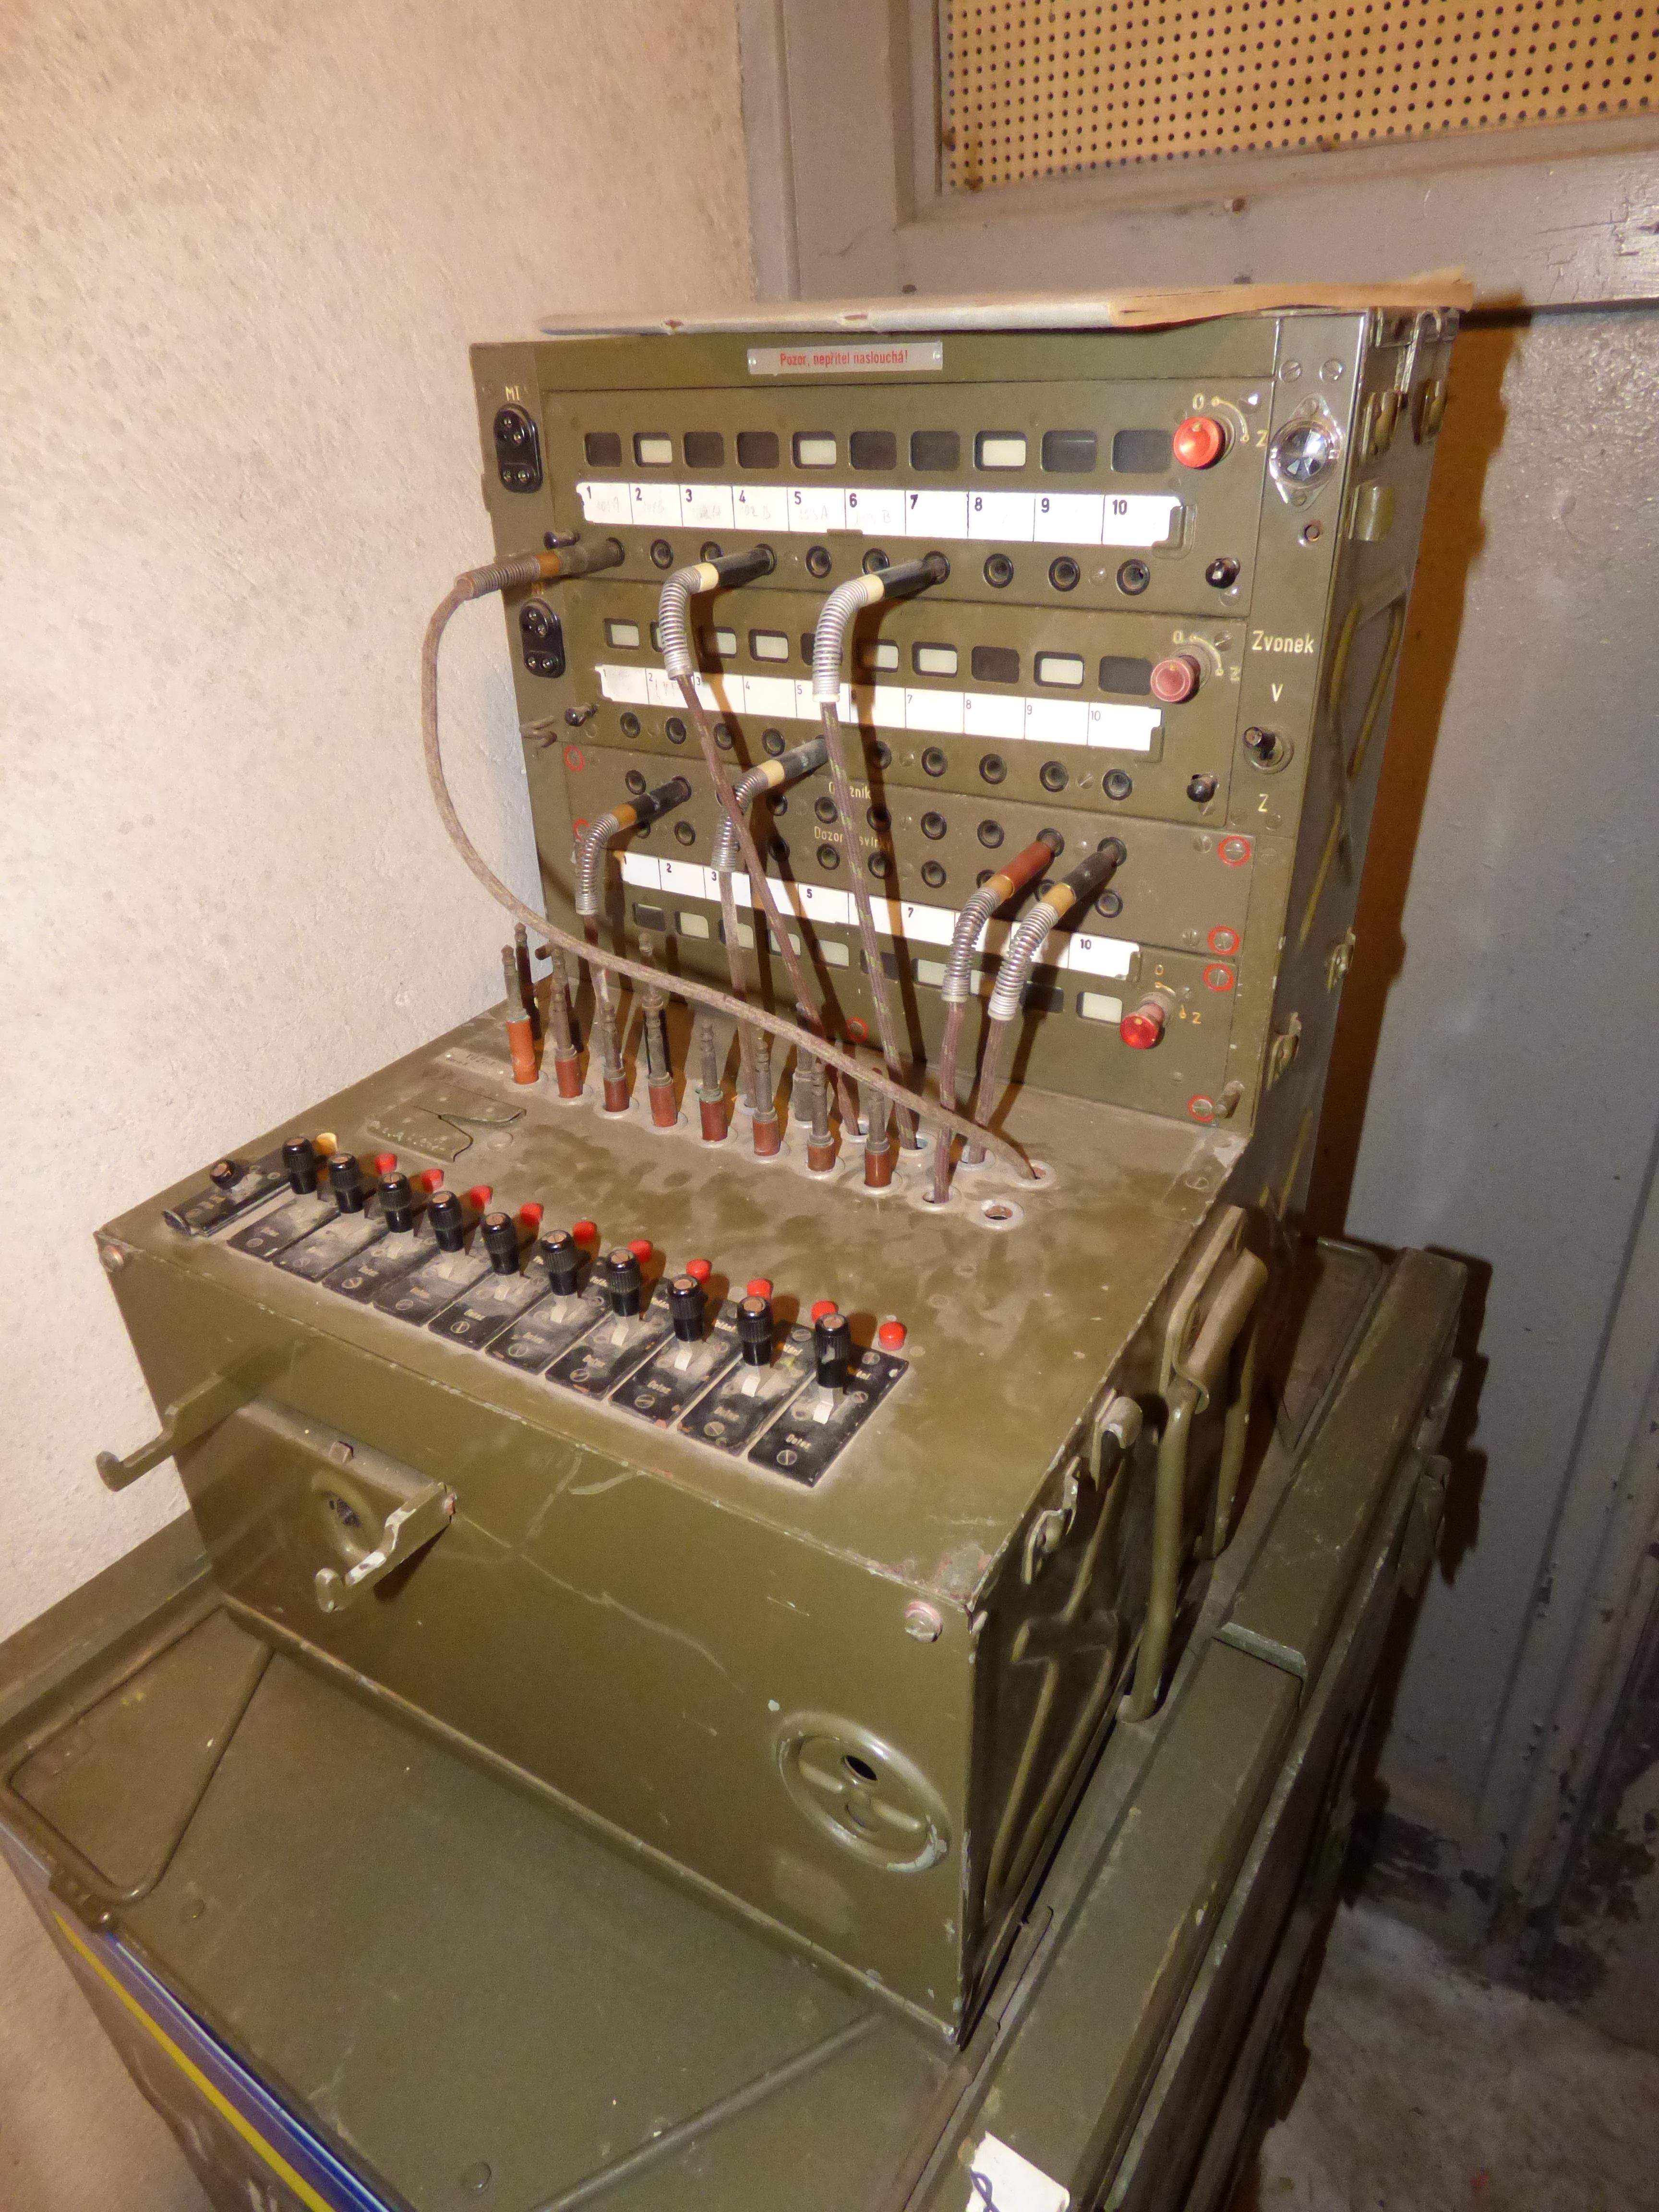 Kostenlose foto : Kabel, Alarm, Militär-, Telefon, Kommunikation ...